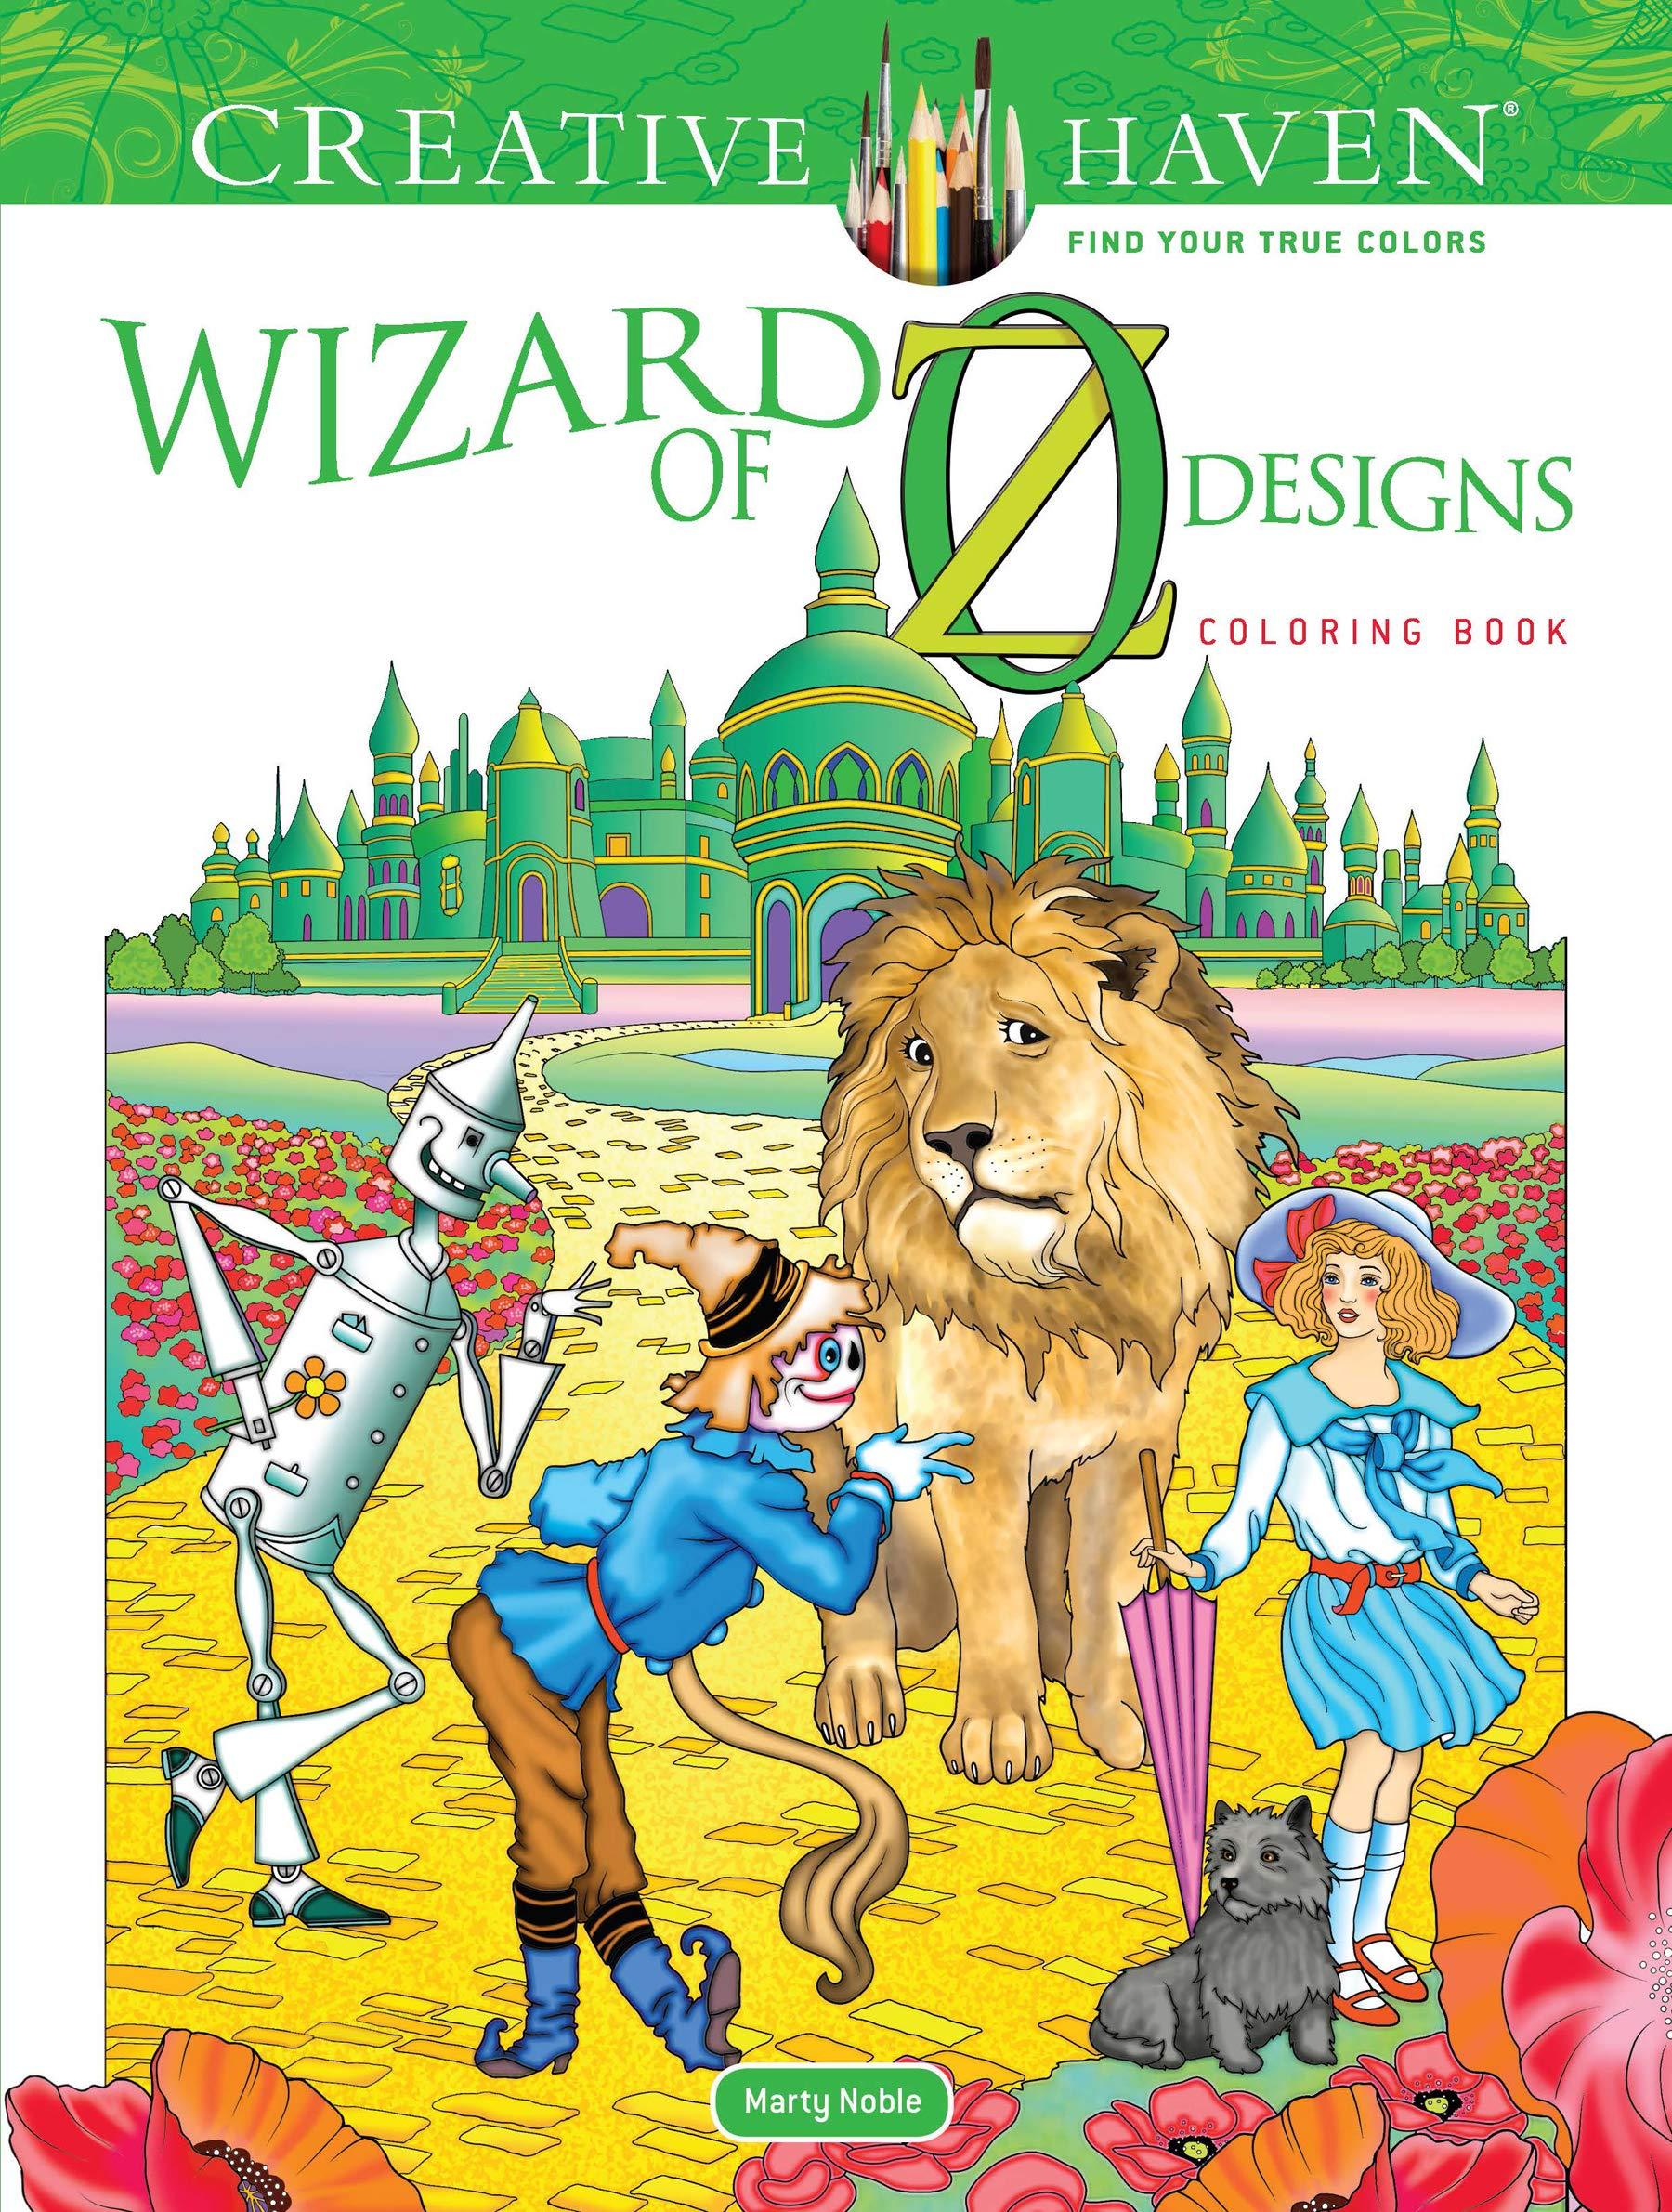 Creative Haven Wizard of Oz Designs Coloring Book (Adult Coloring) pdf